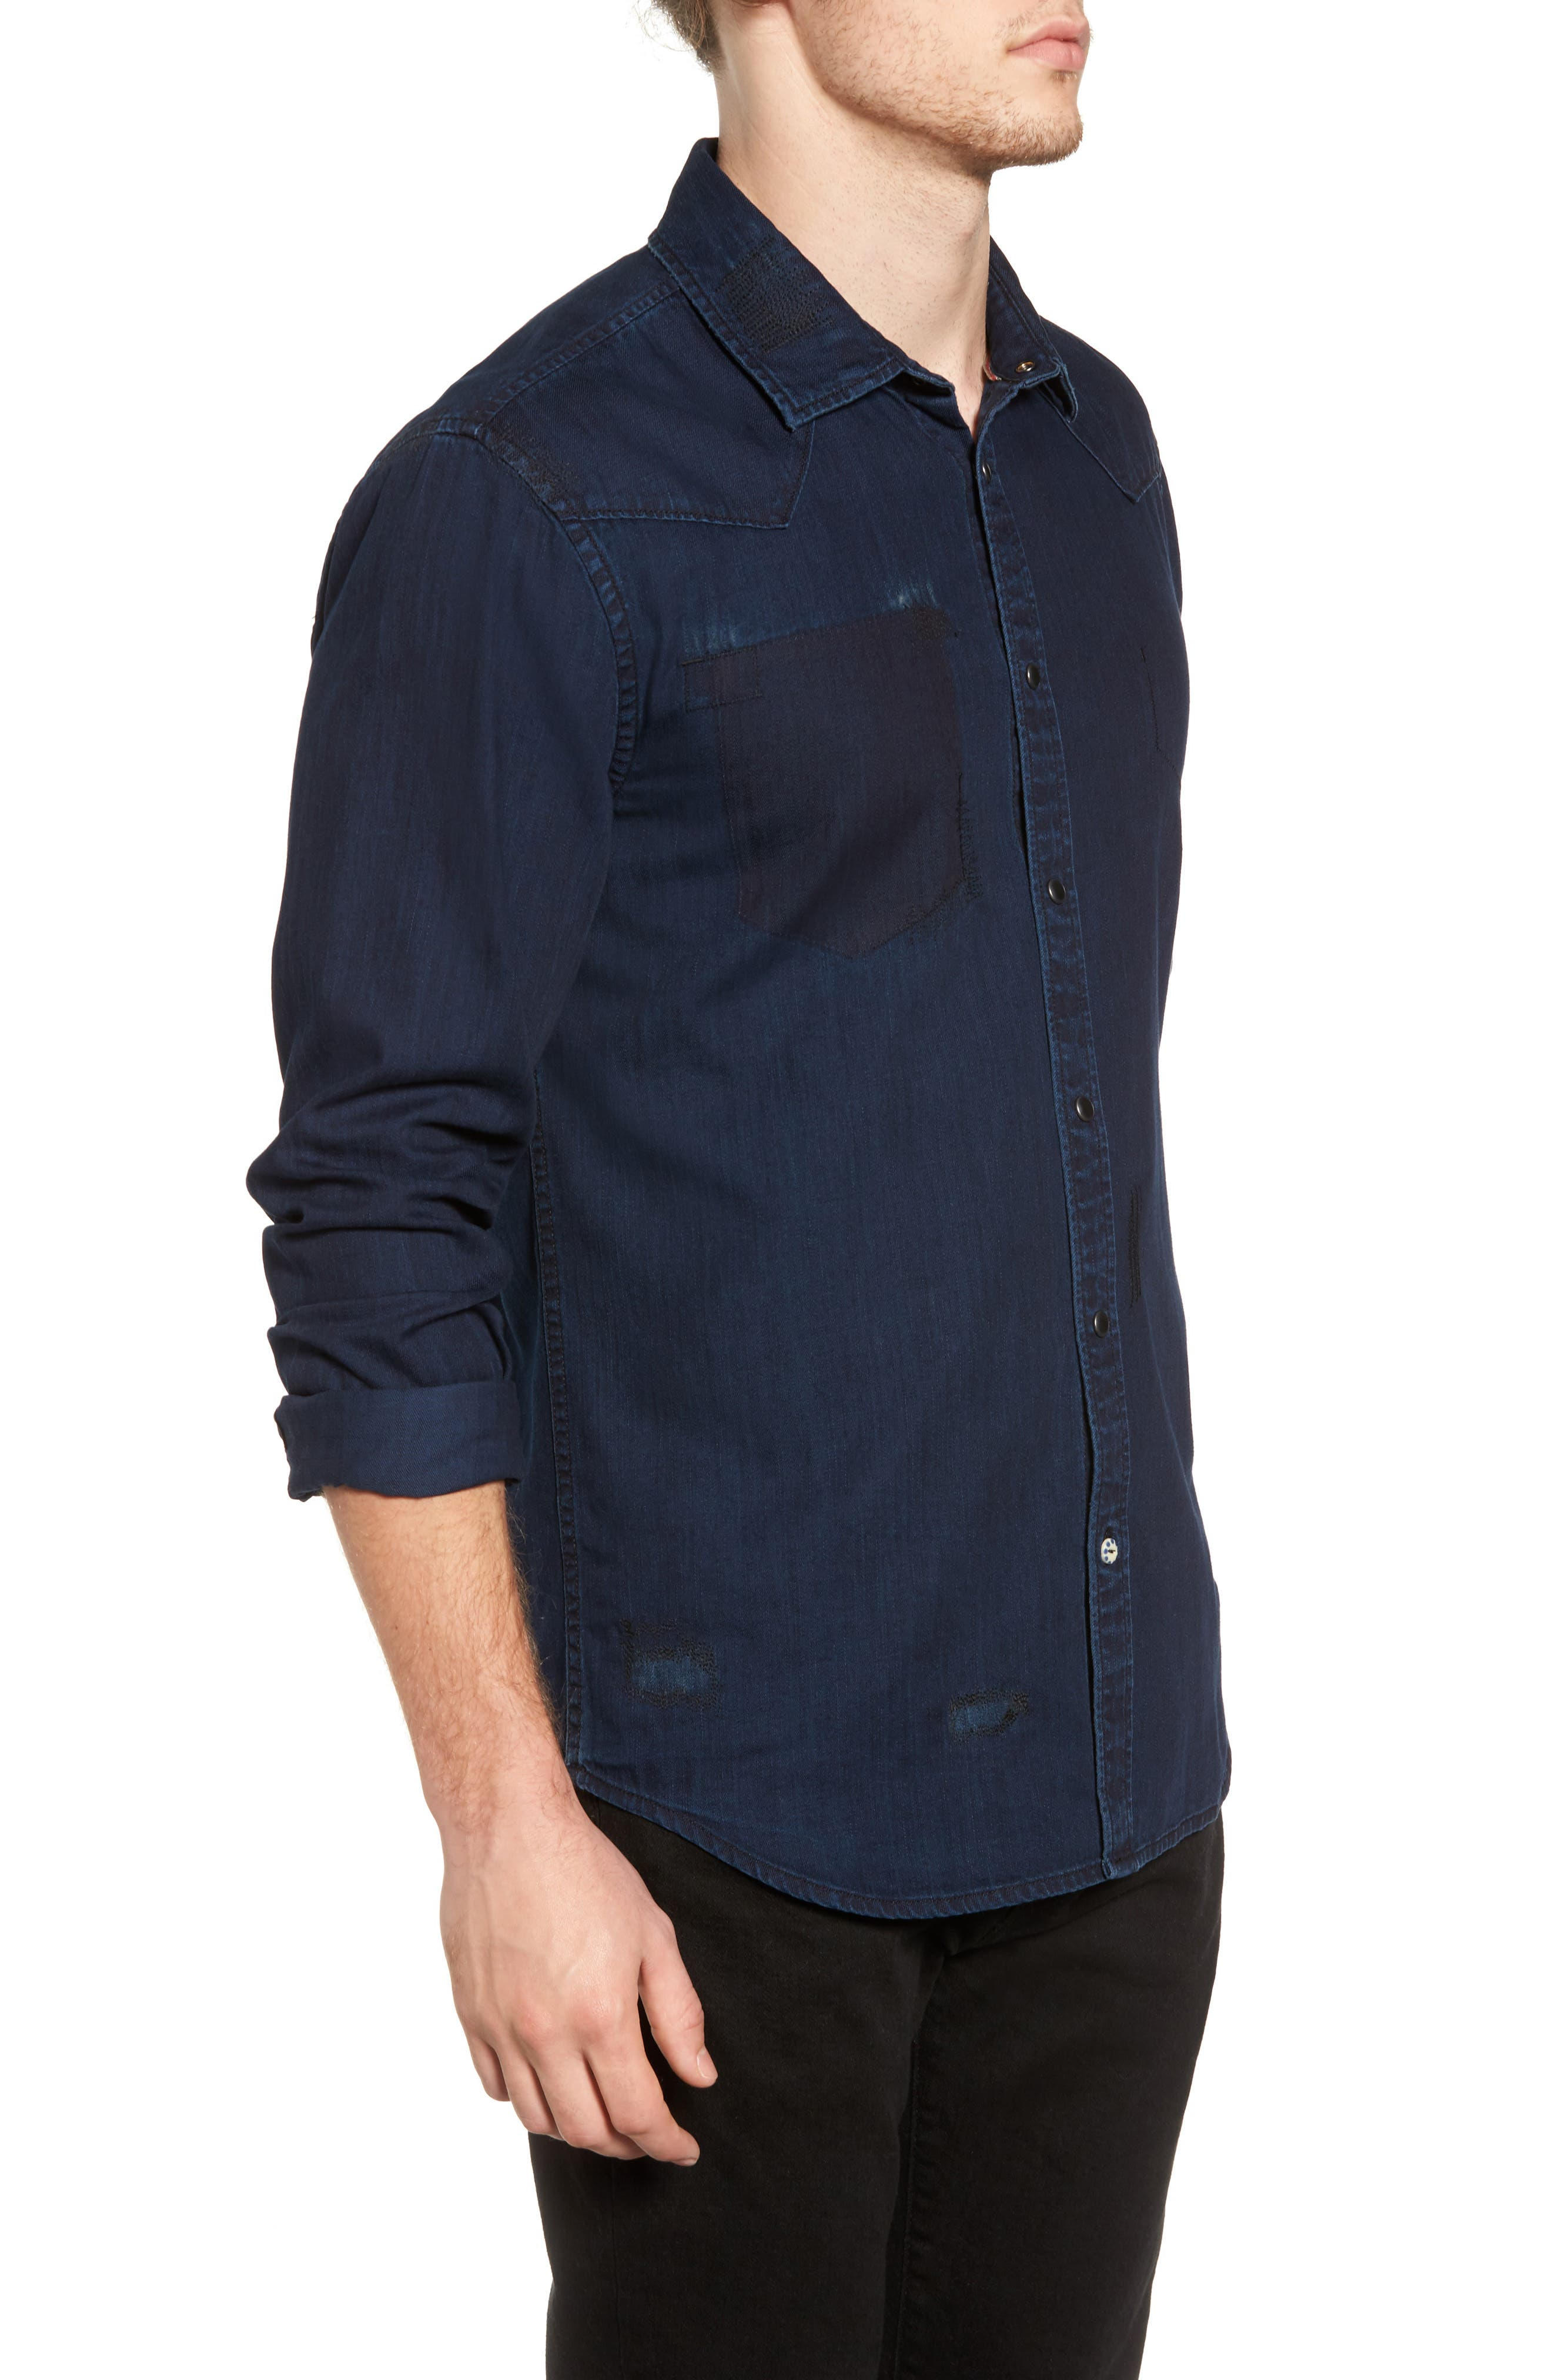 Pocketless Western Denim Shirt,                             Alternate thumbnail 3, color,